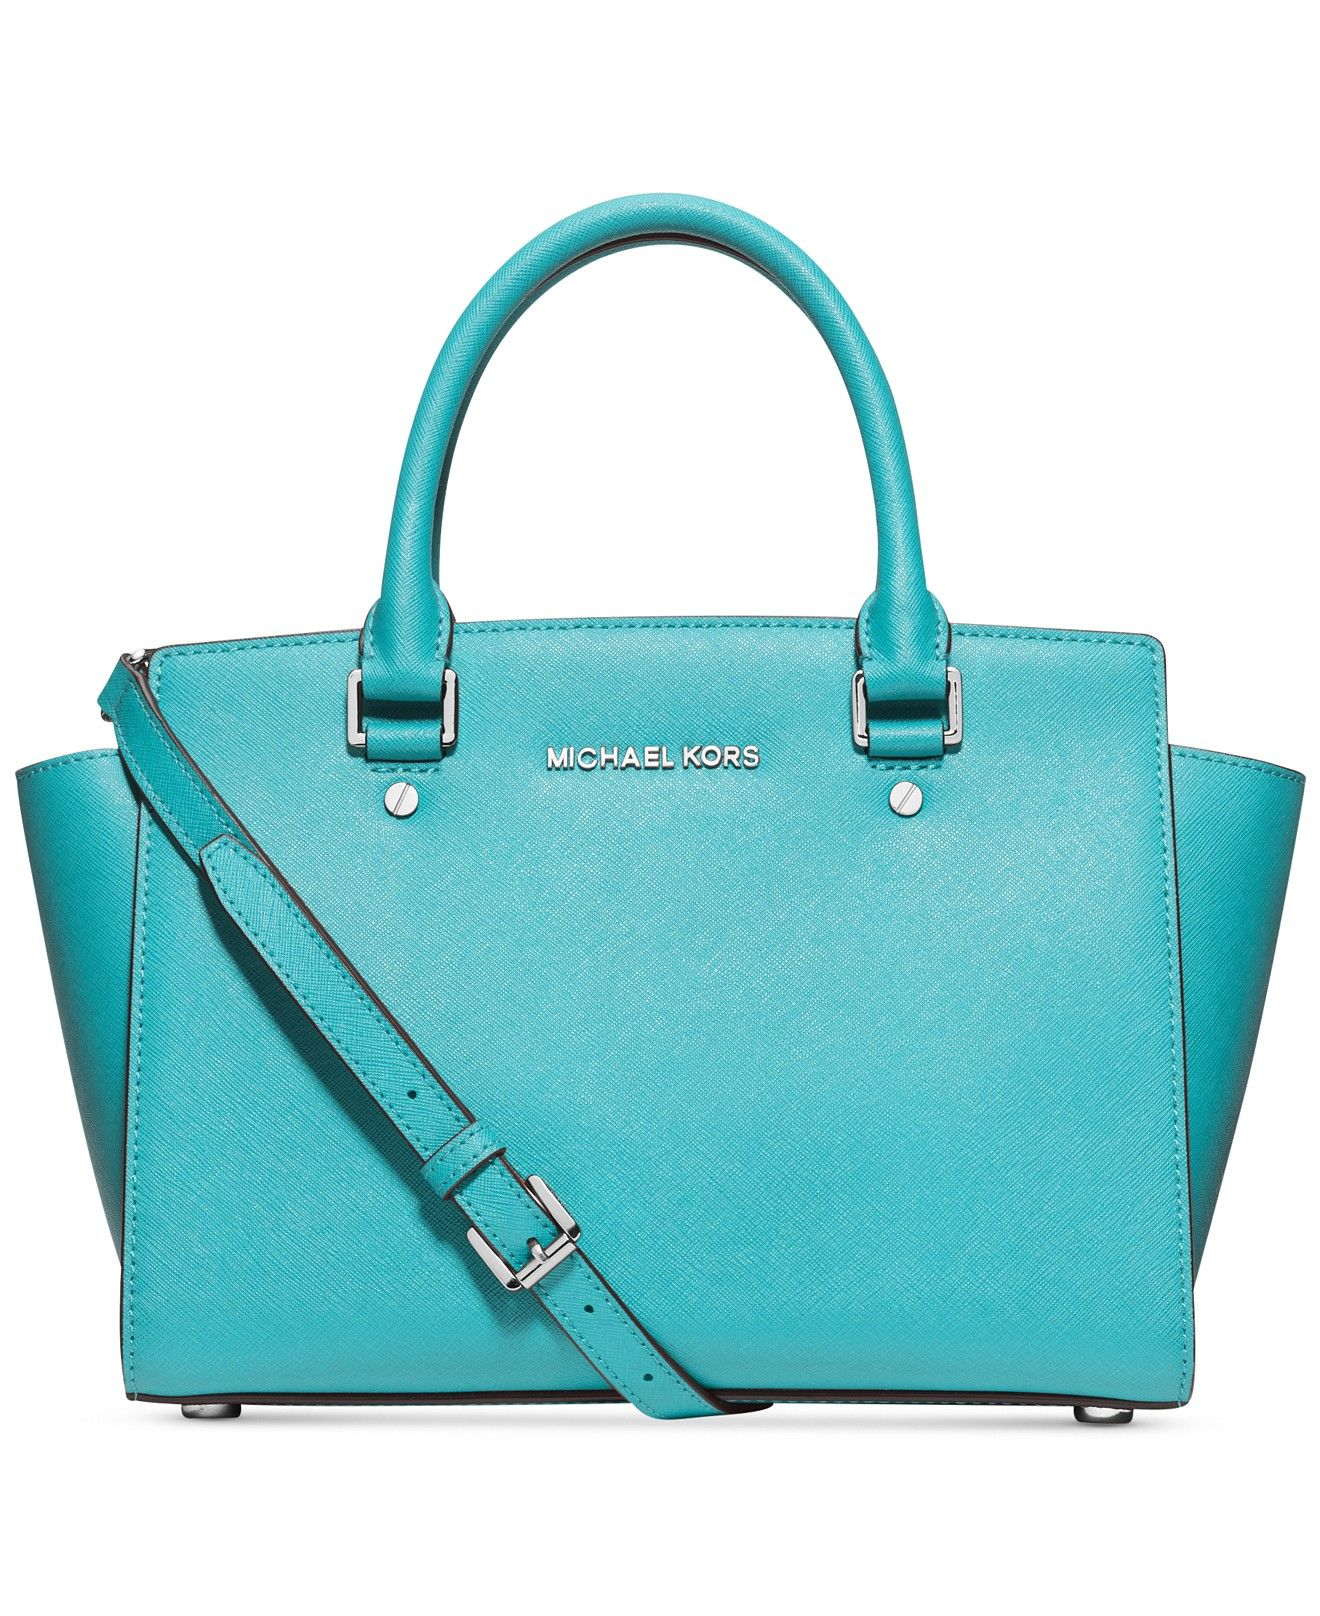 9678d704e5b4 MICHAEL Michael Kors Selma Medium Satchel - Handbags & Accessories - Macy's